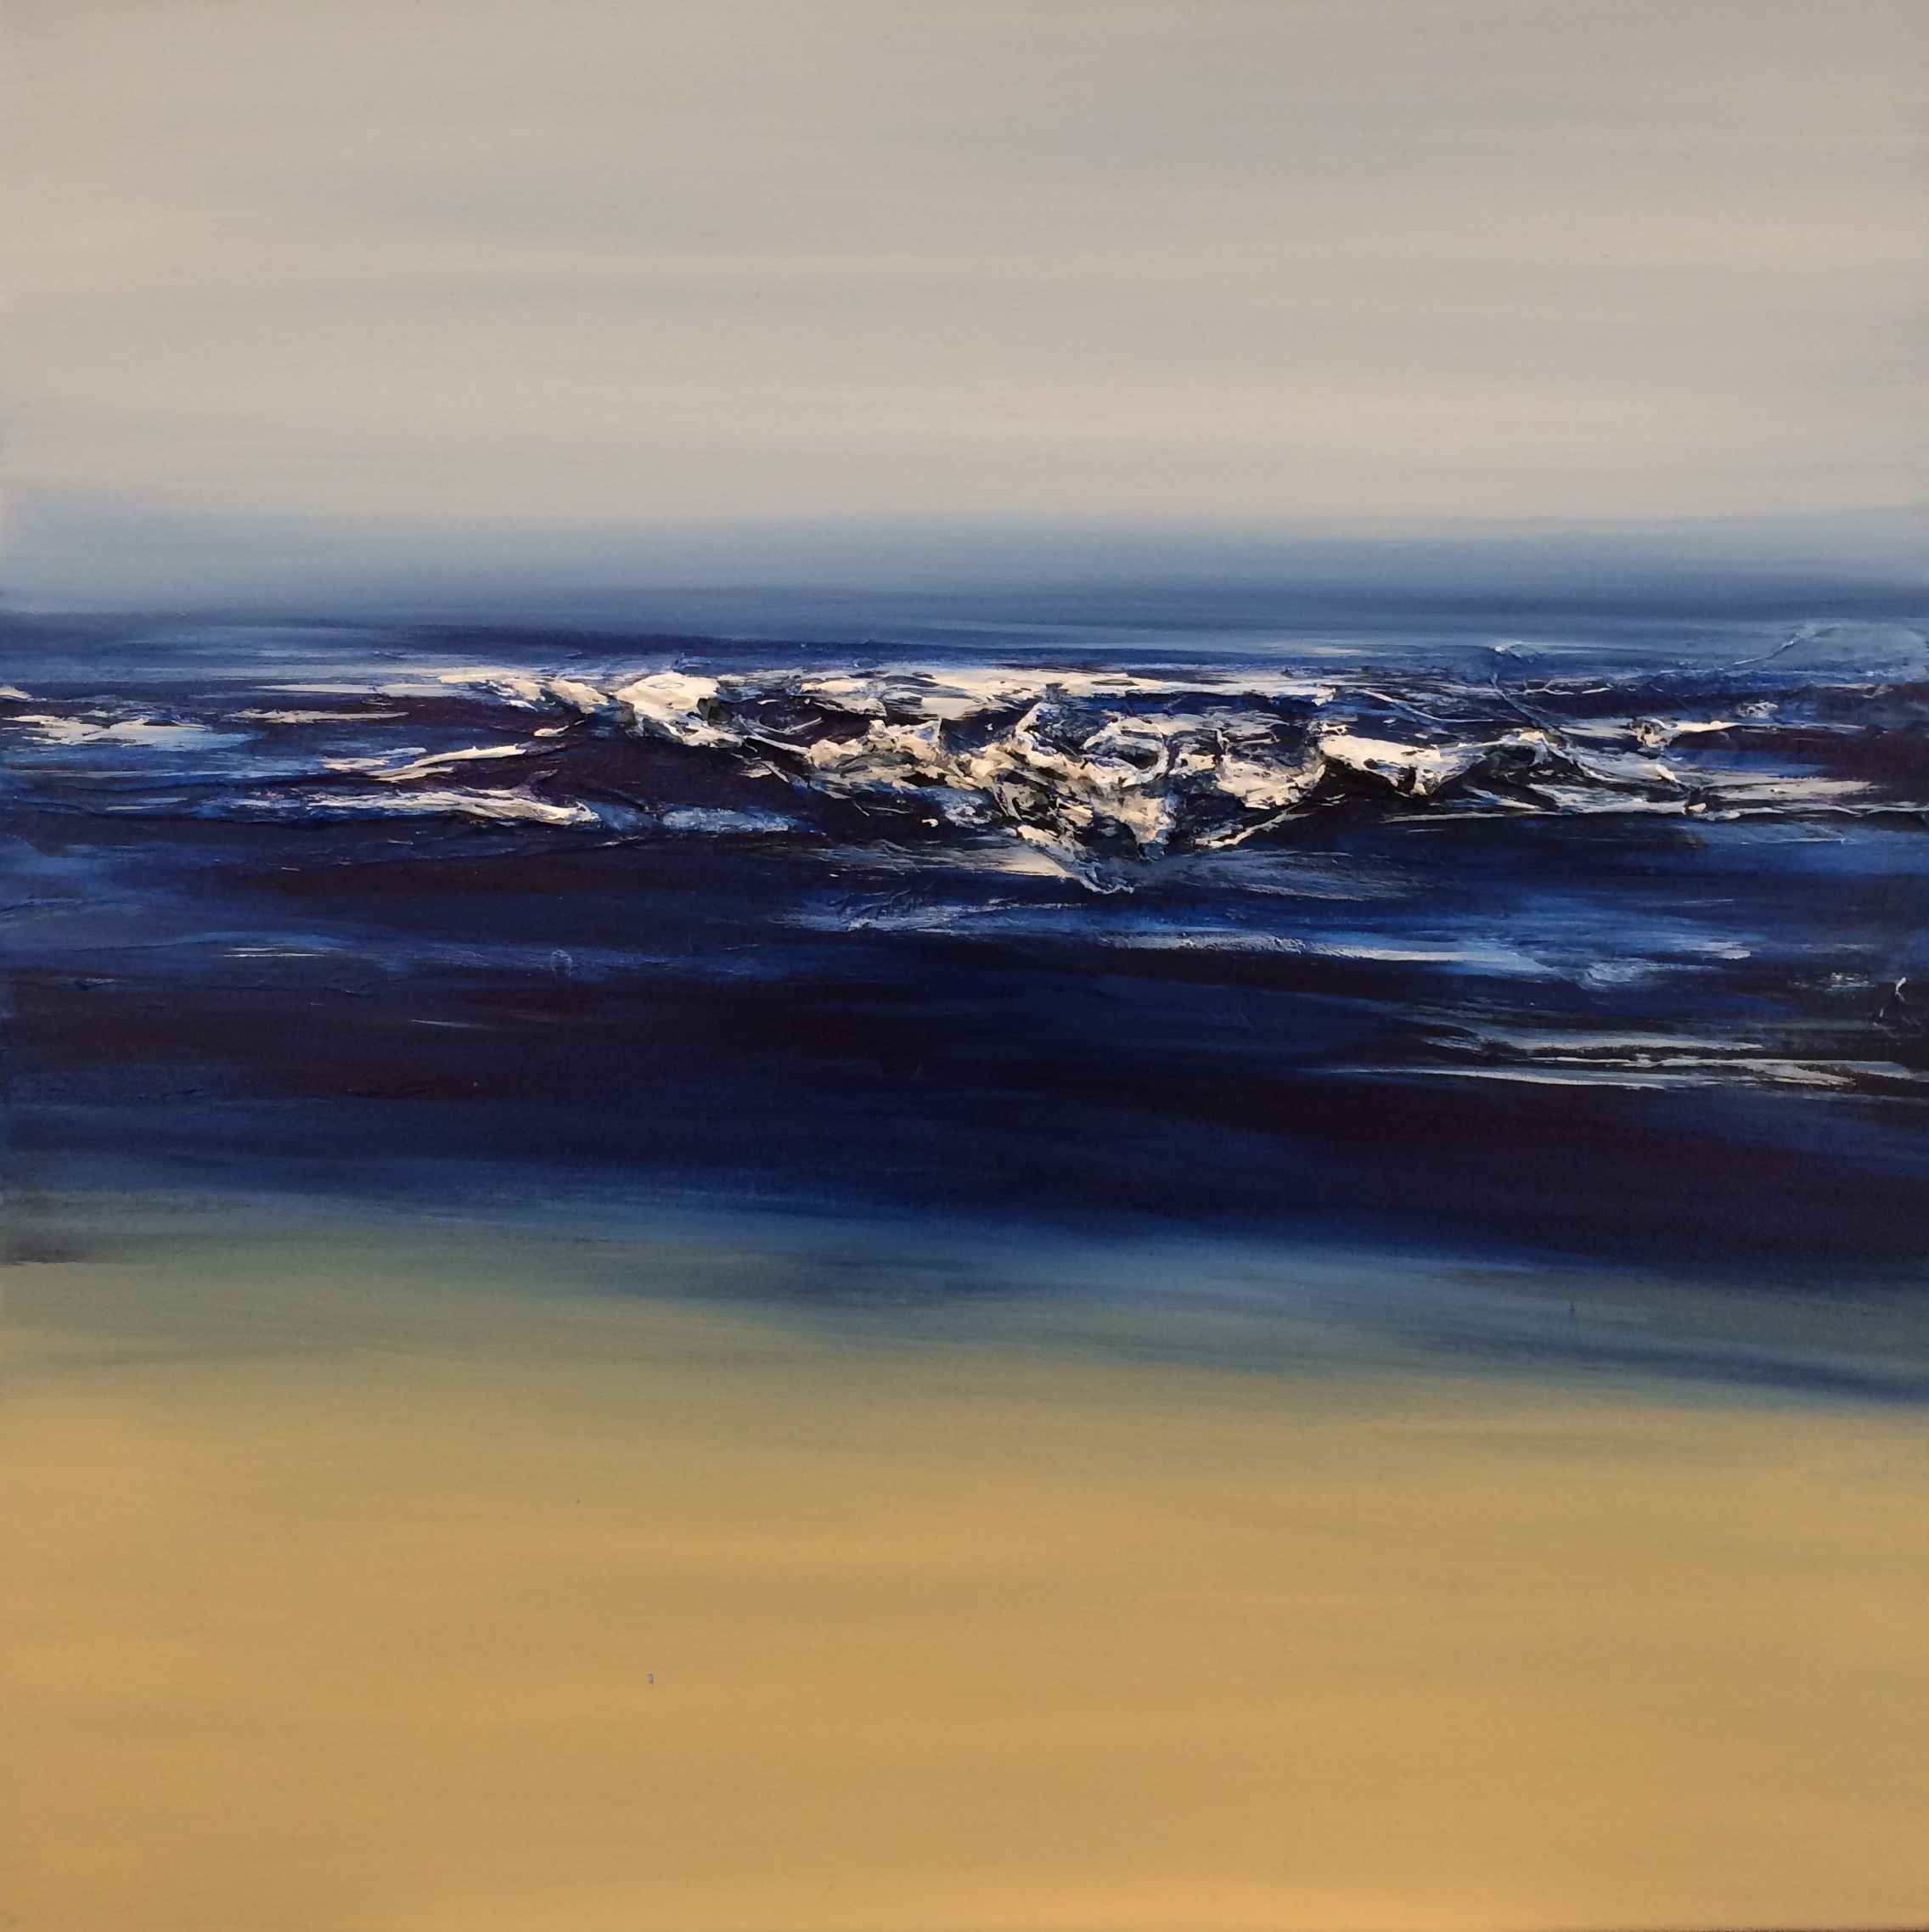 Spring Breaker by  Steve Lyons - Masterpiece Online